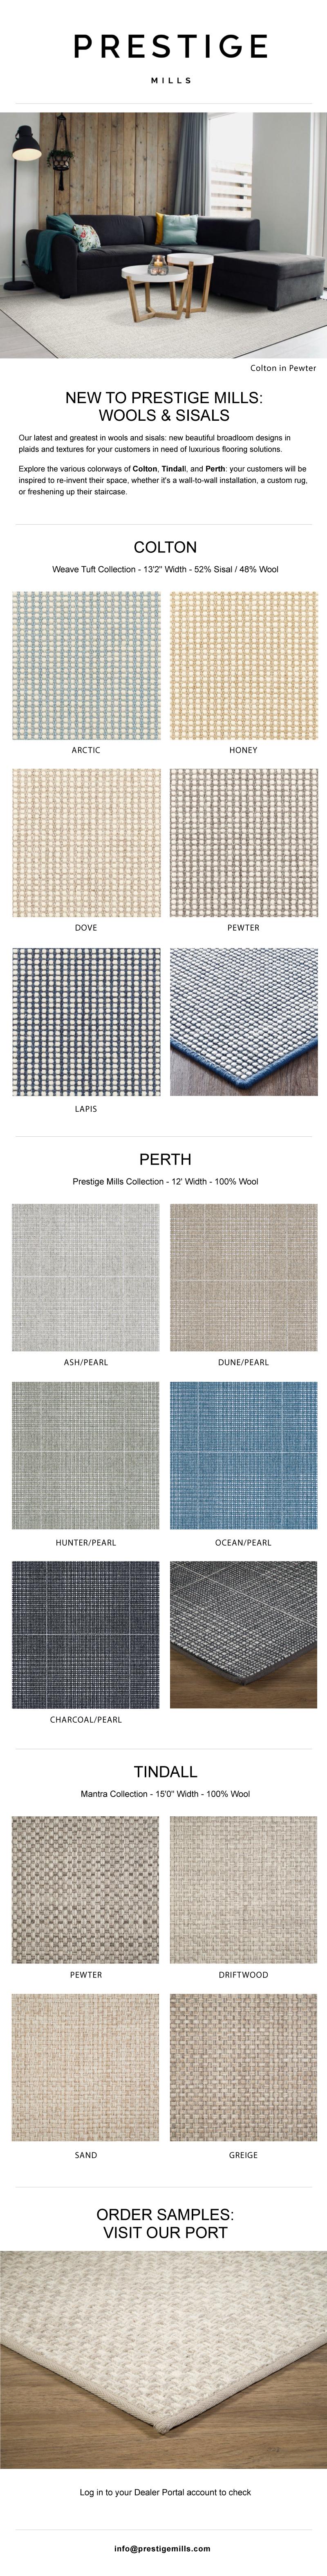 New to Prestige Mills | Wilton Wools & Woven Sisals